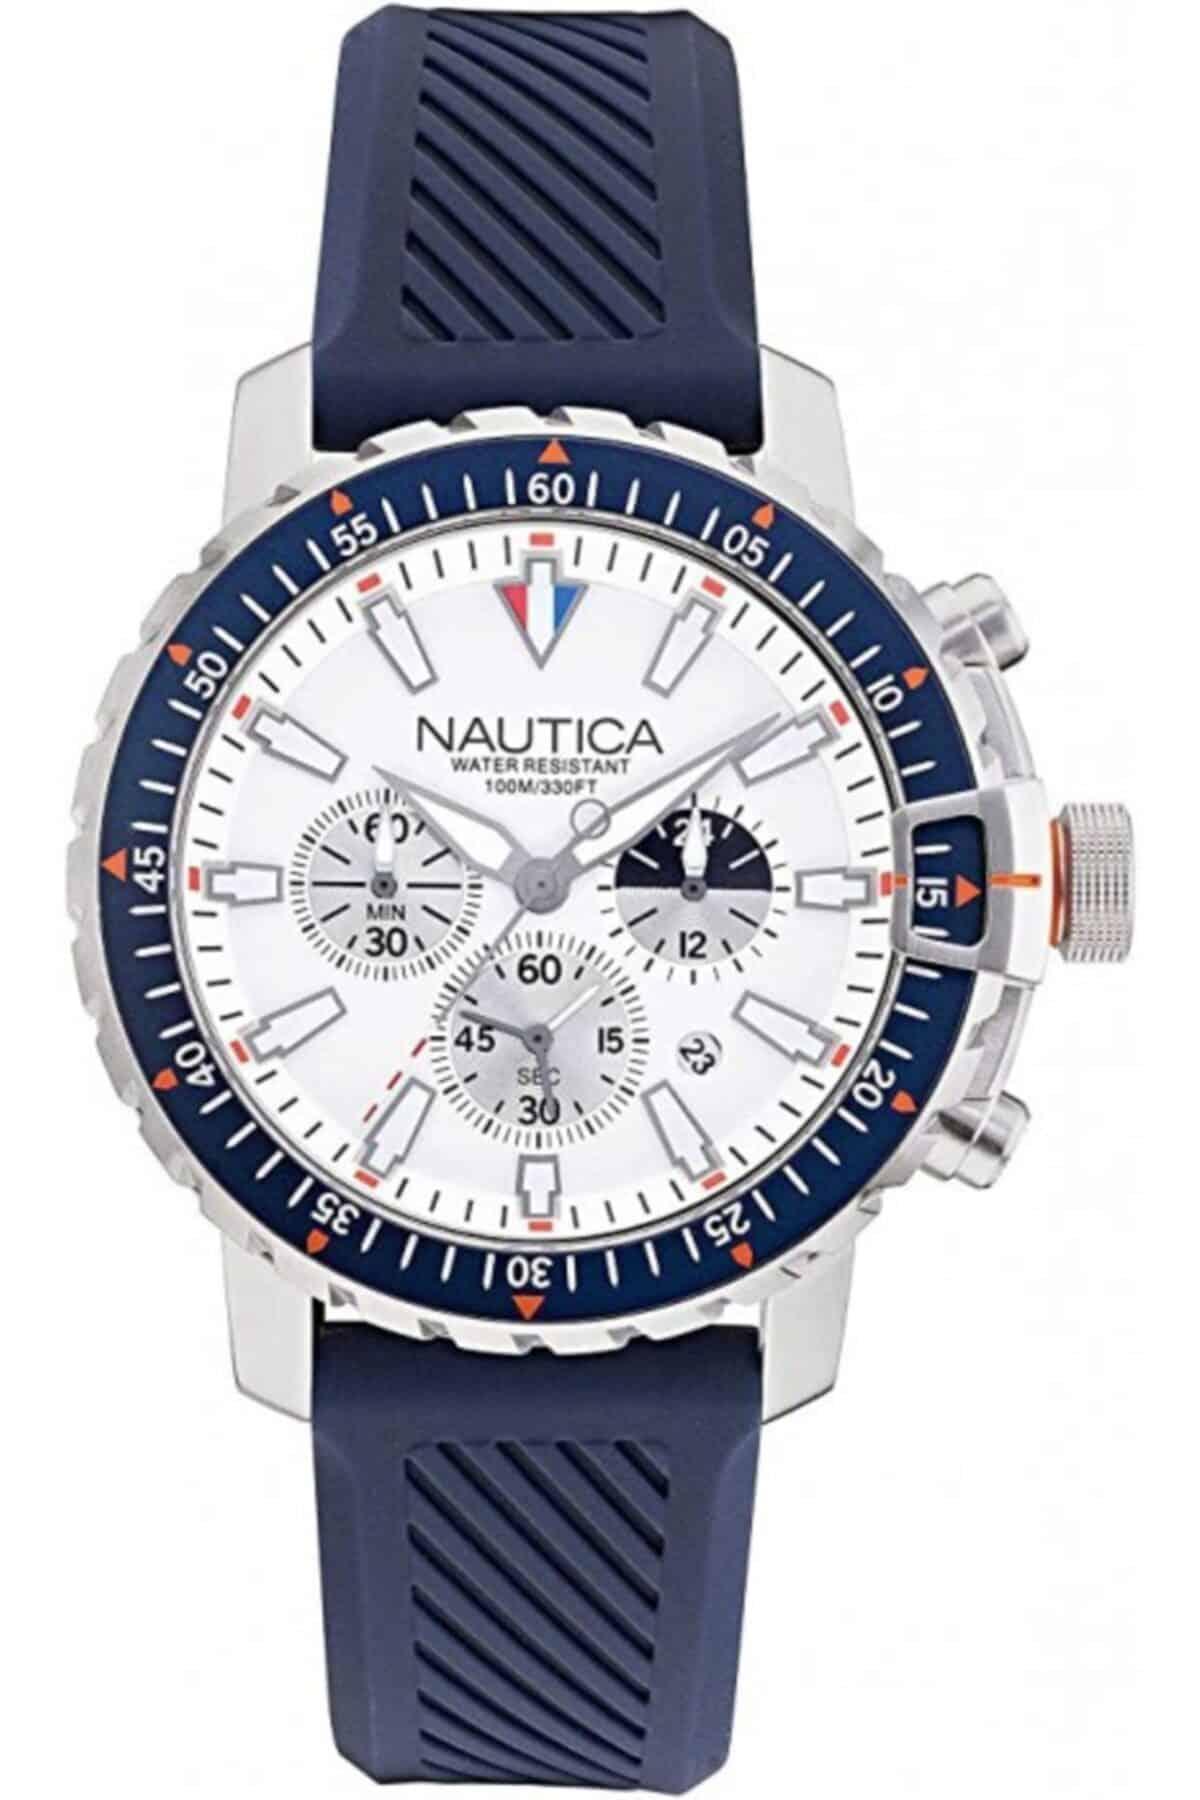 Nautica Erkek Kol Saati NAPICS010